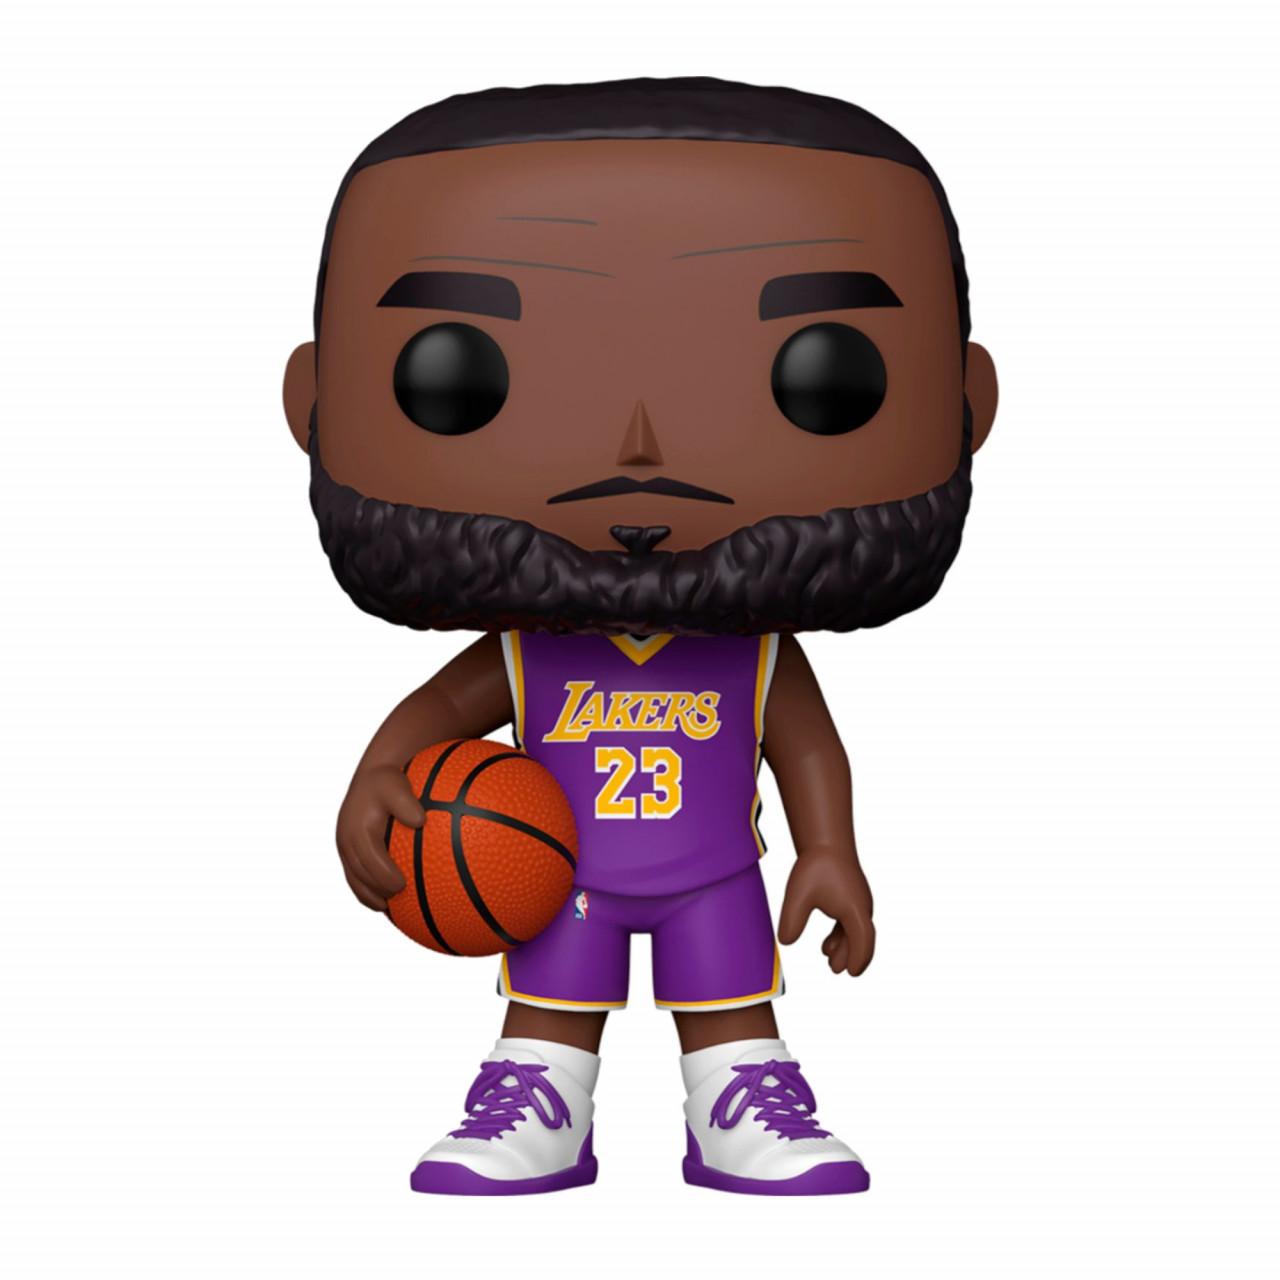 NBA POP! LEBRON JAMES